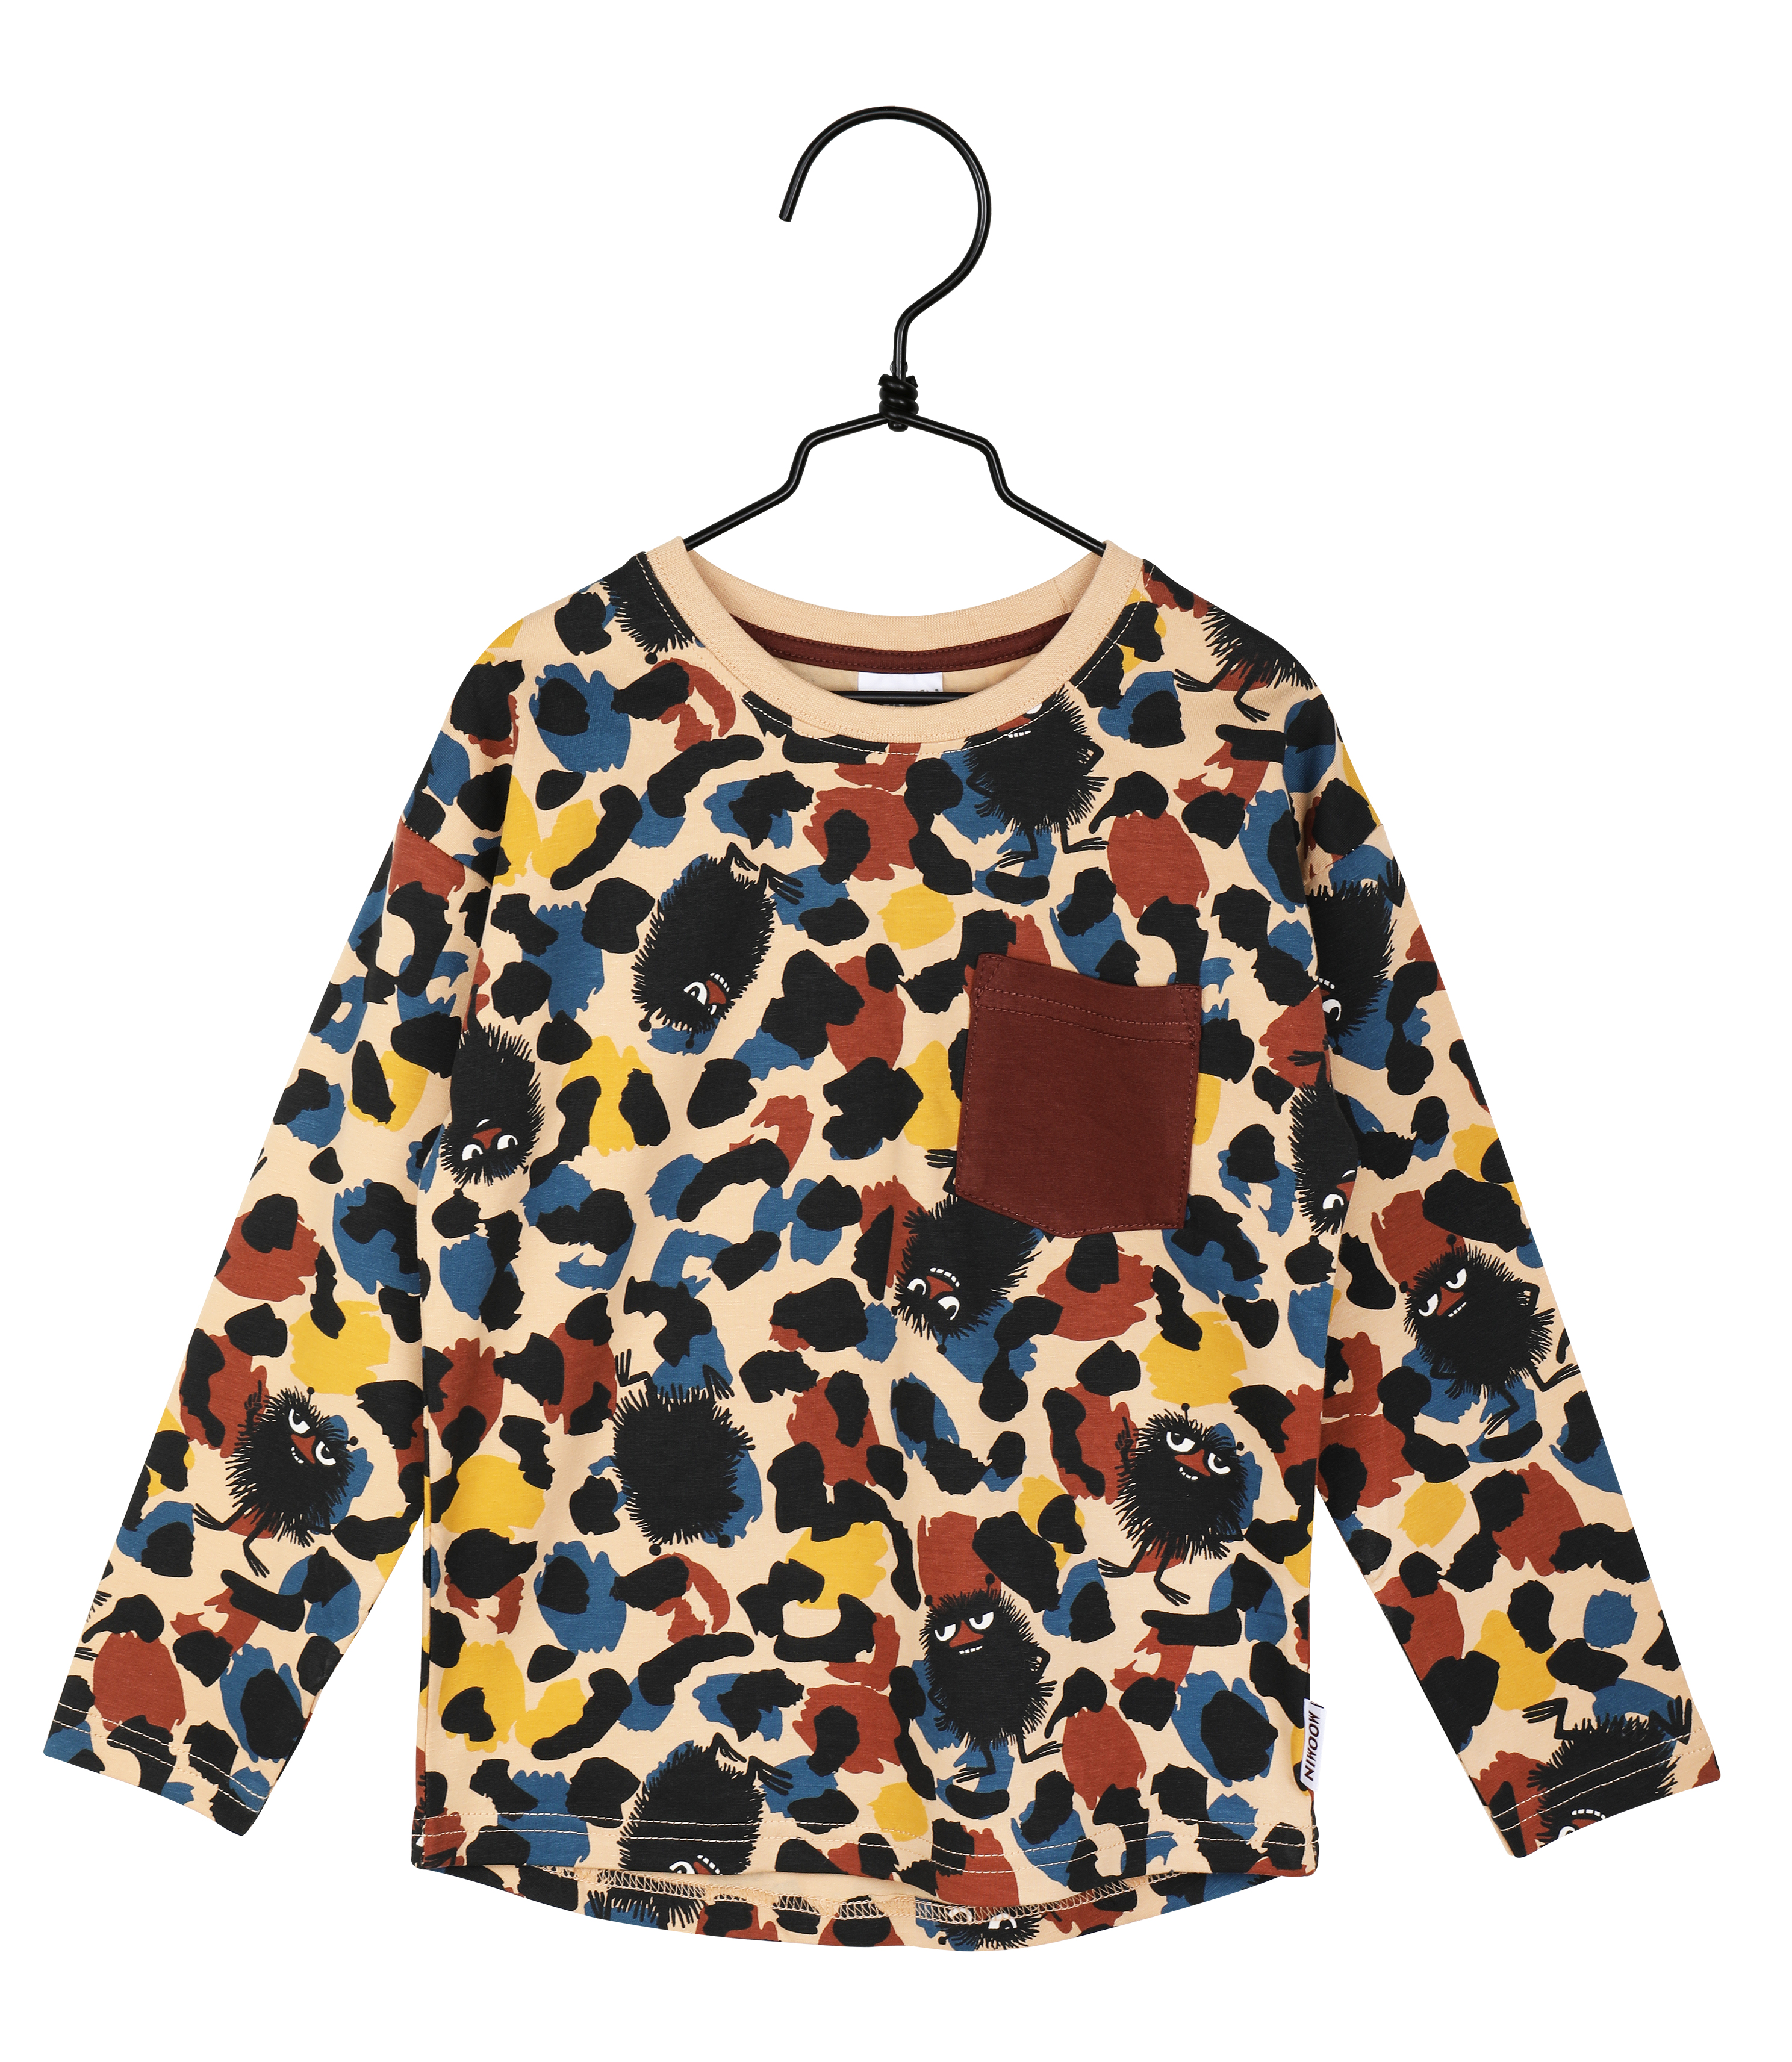 Martinex Moomin Wild Shirt Beige